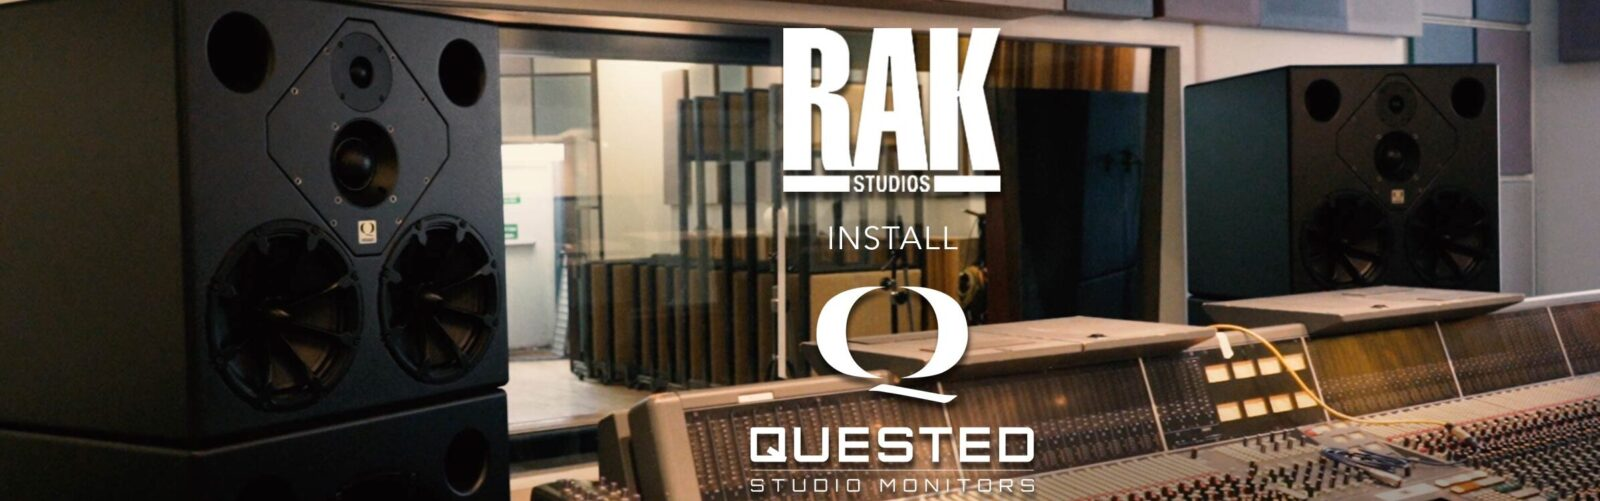 RAK-&-Quested